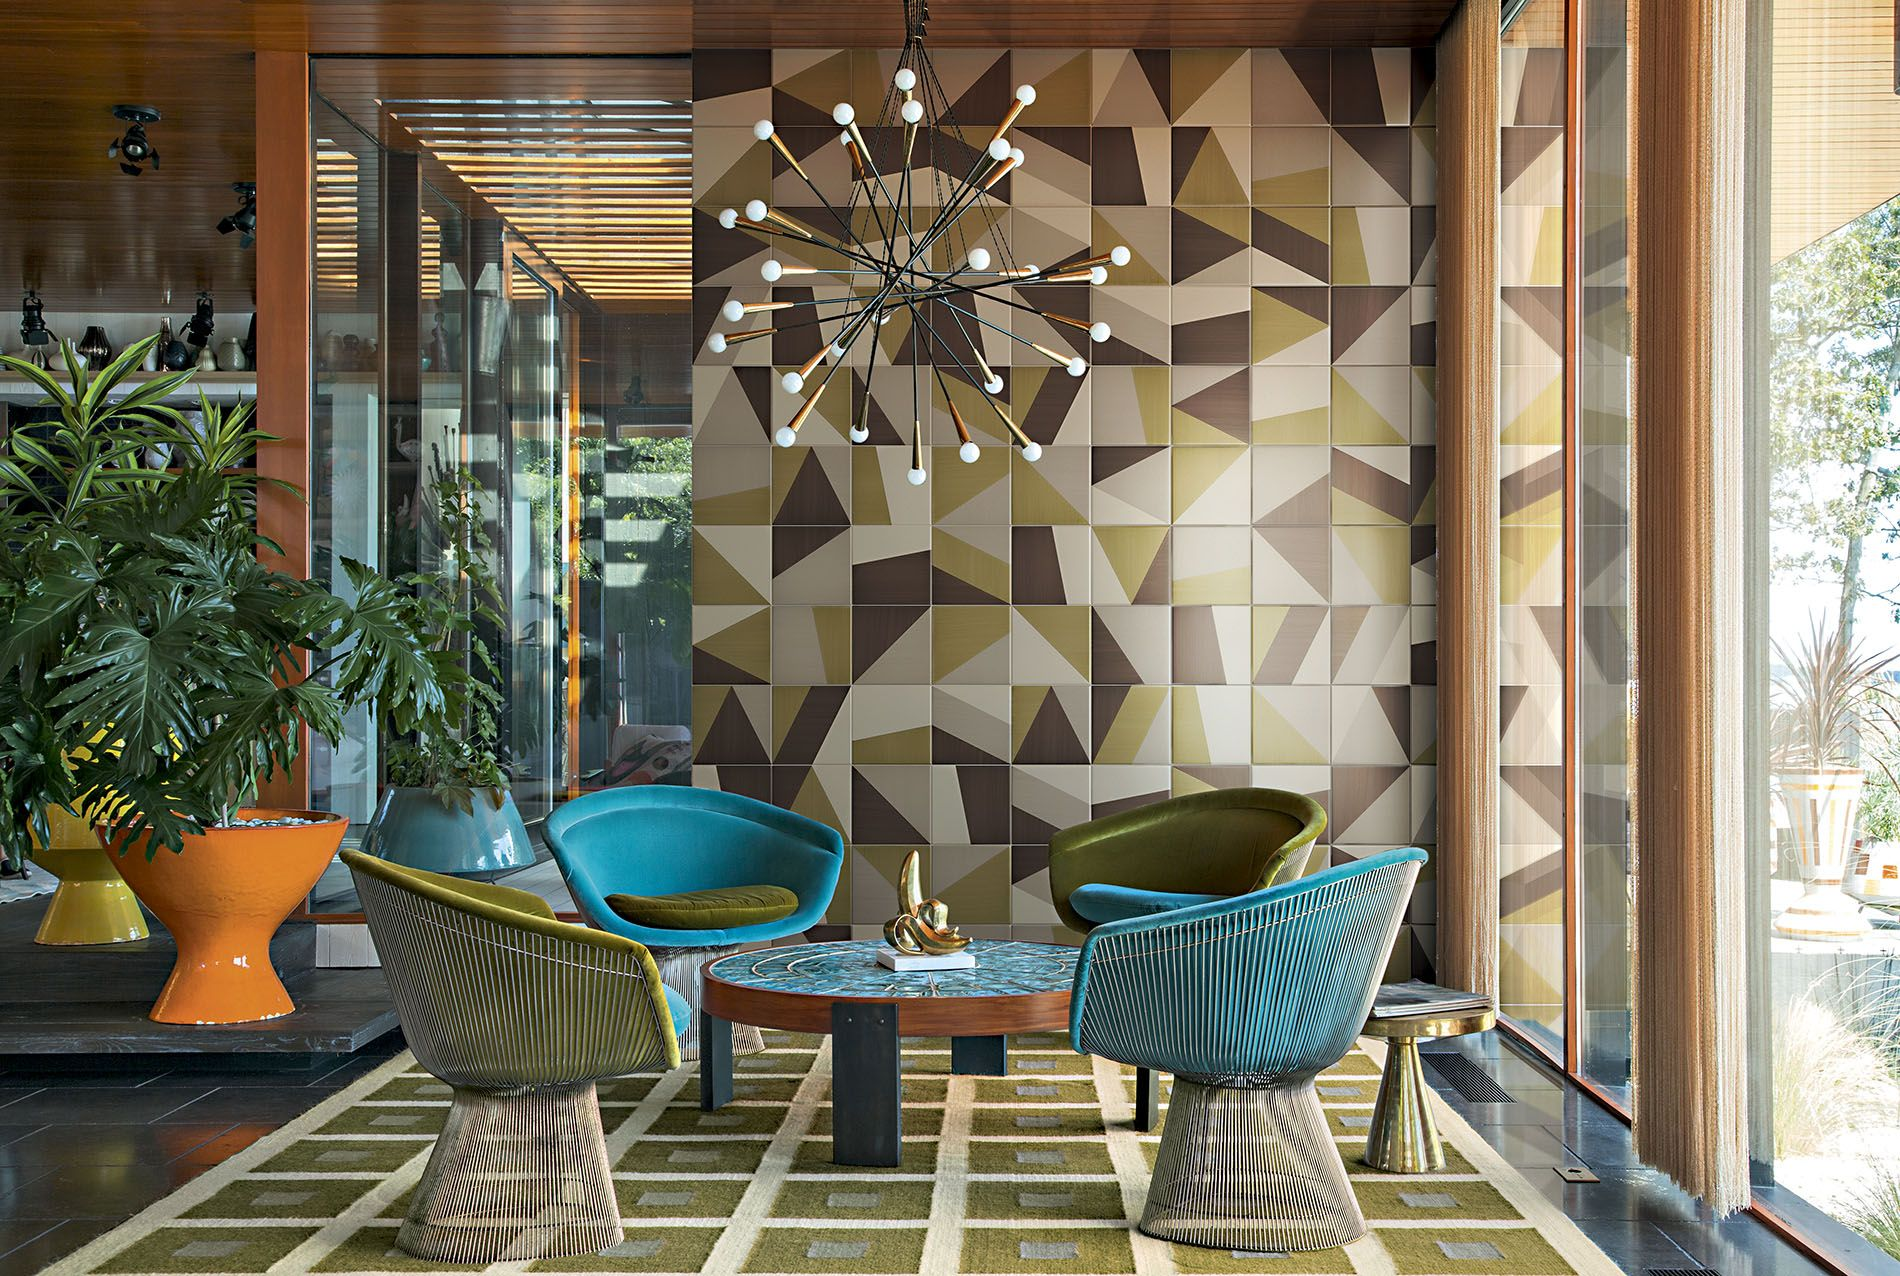 Tangram Tile Floor Wall Deco Wall Tiles